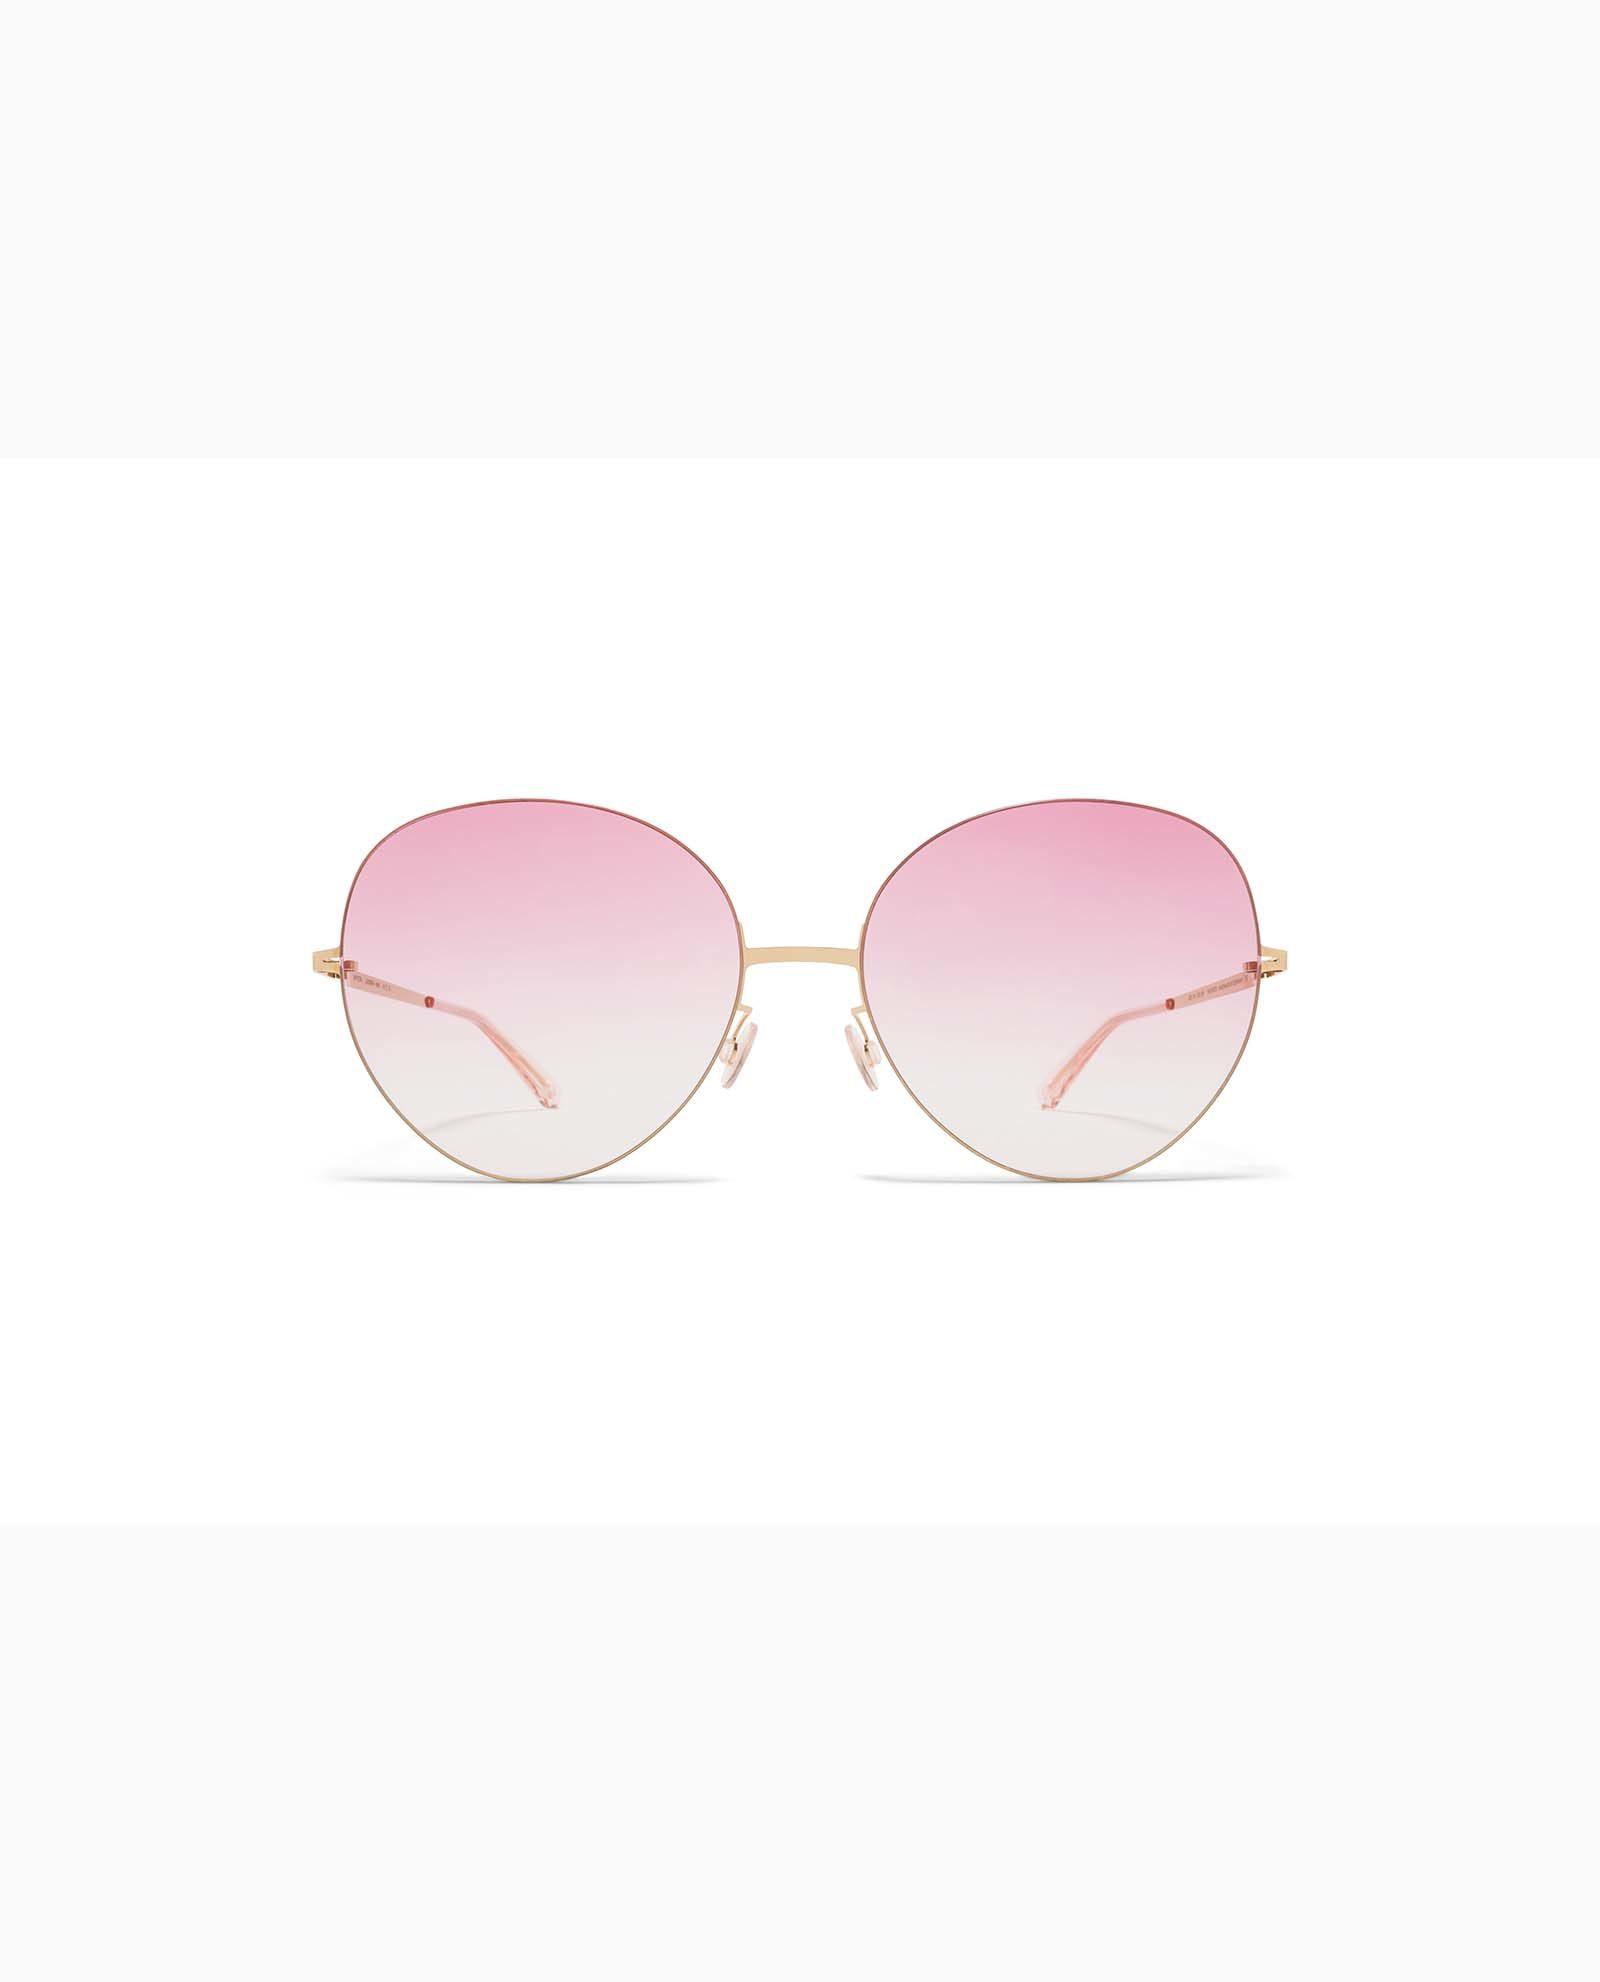 mykita-less-rim-sun-aimi-champagne-gold-jelly-pink-gradient-1-woman